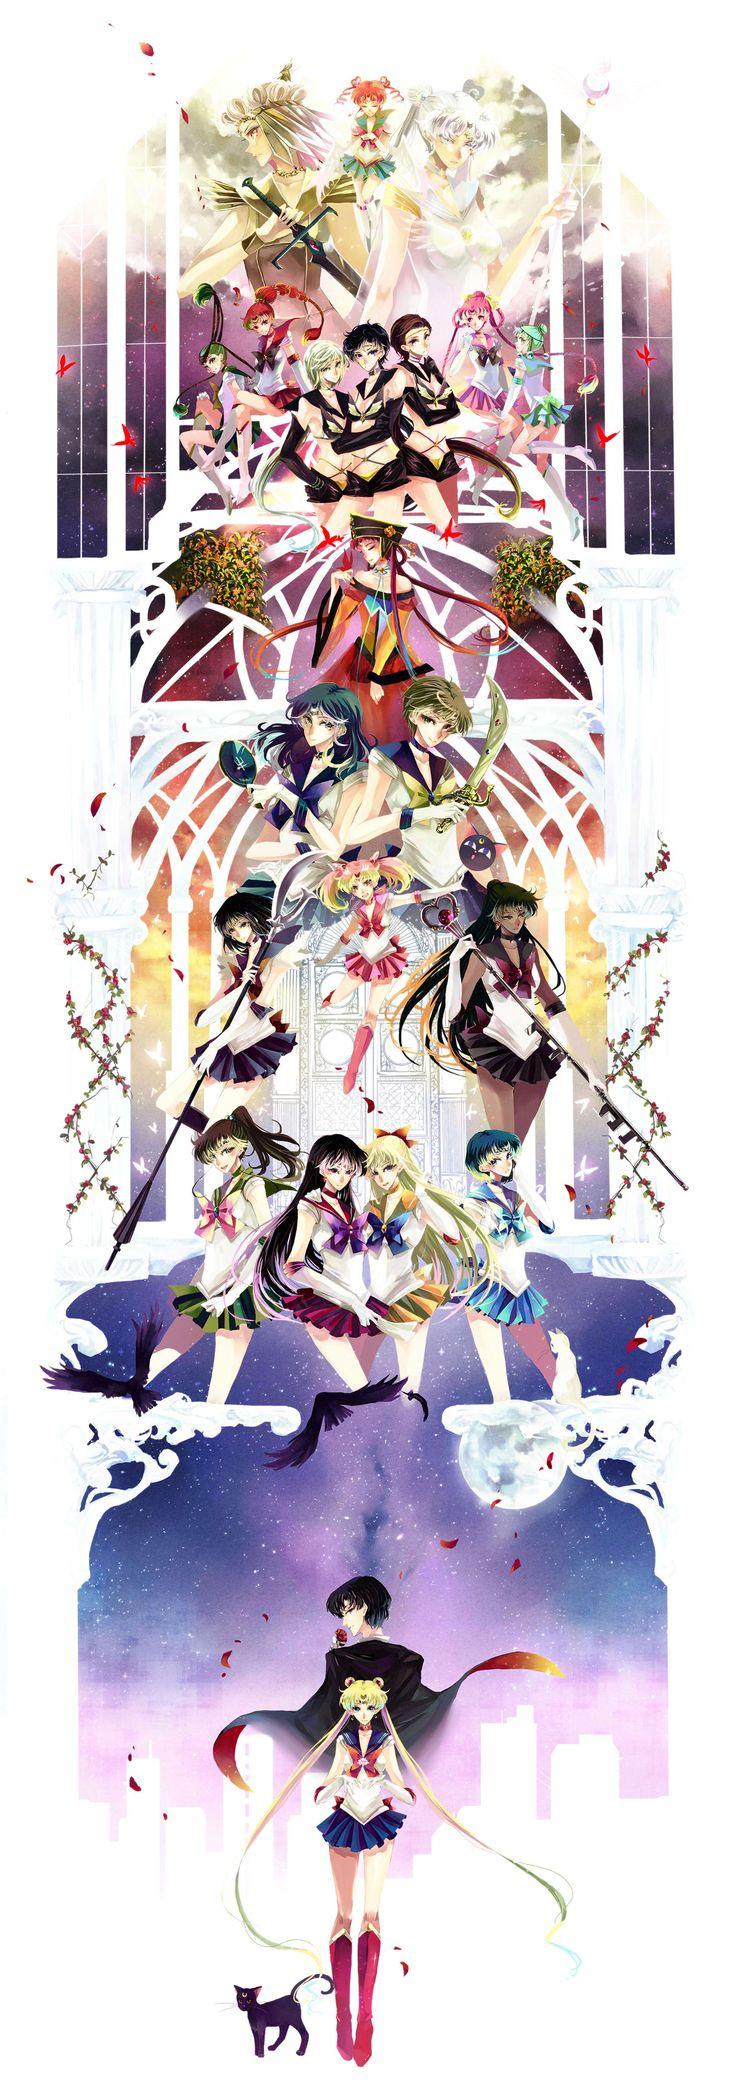 Sailor Moon full cast